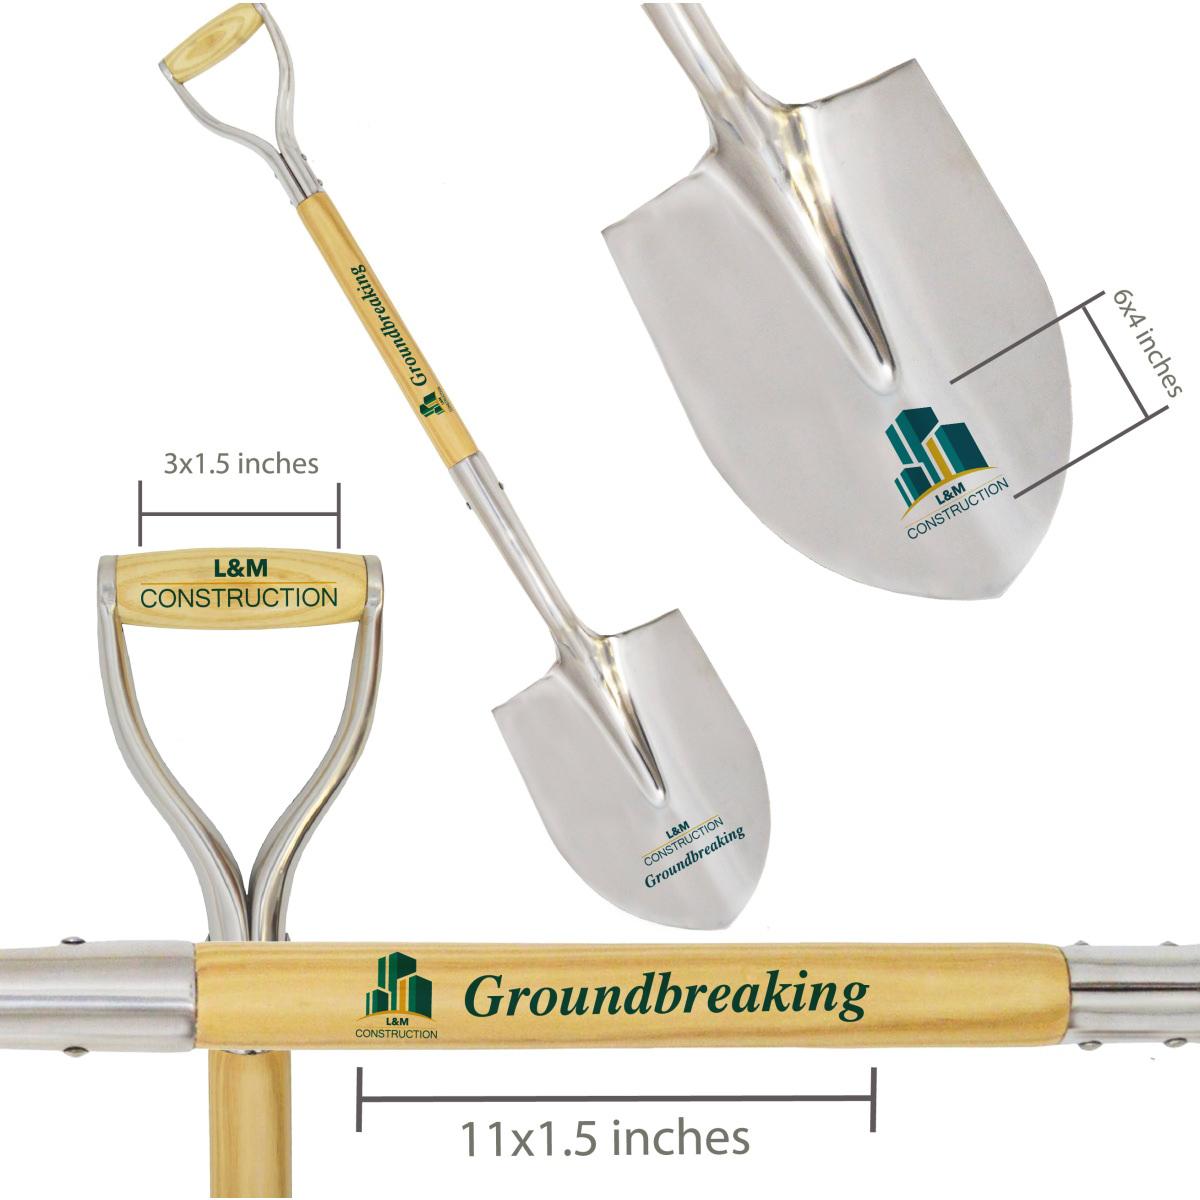 deluxe-groundbreaking-shovel-customizable-direct-print